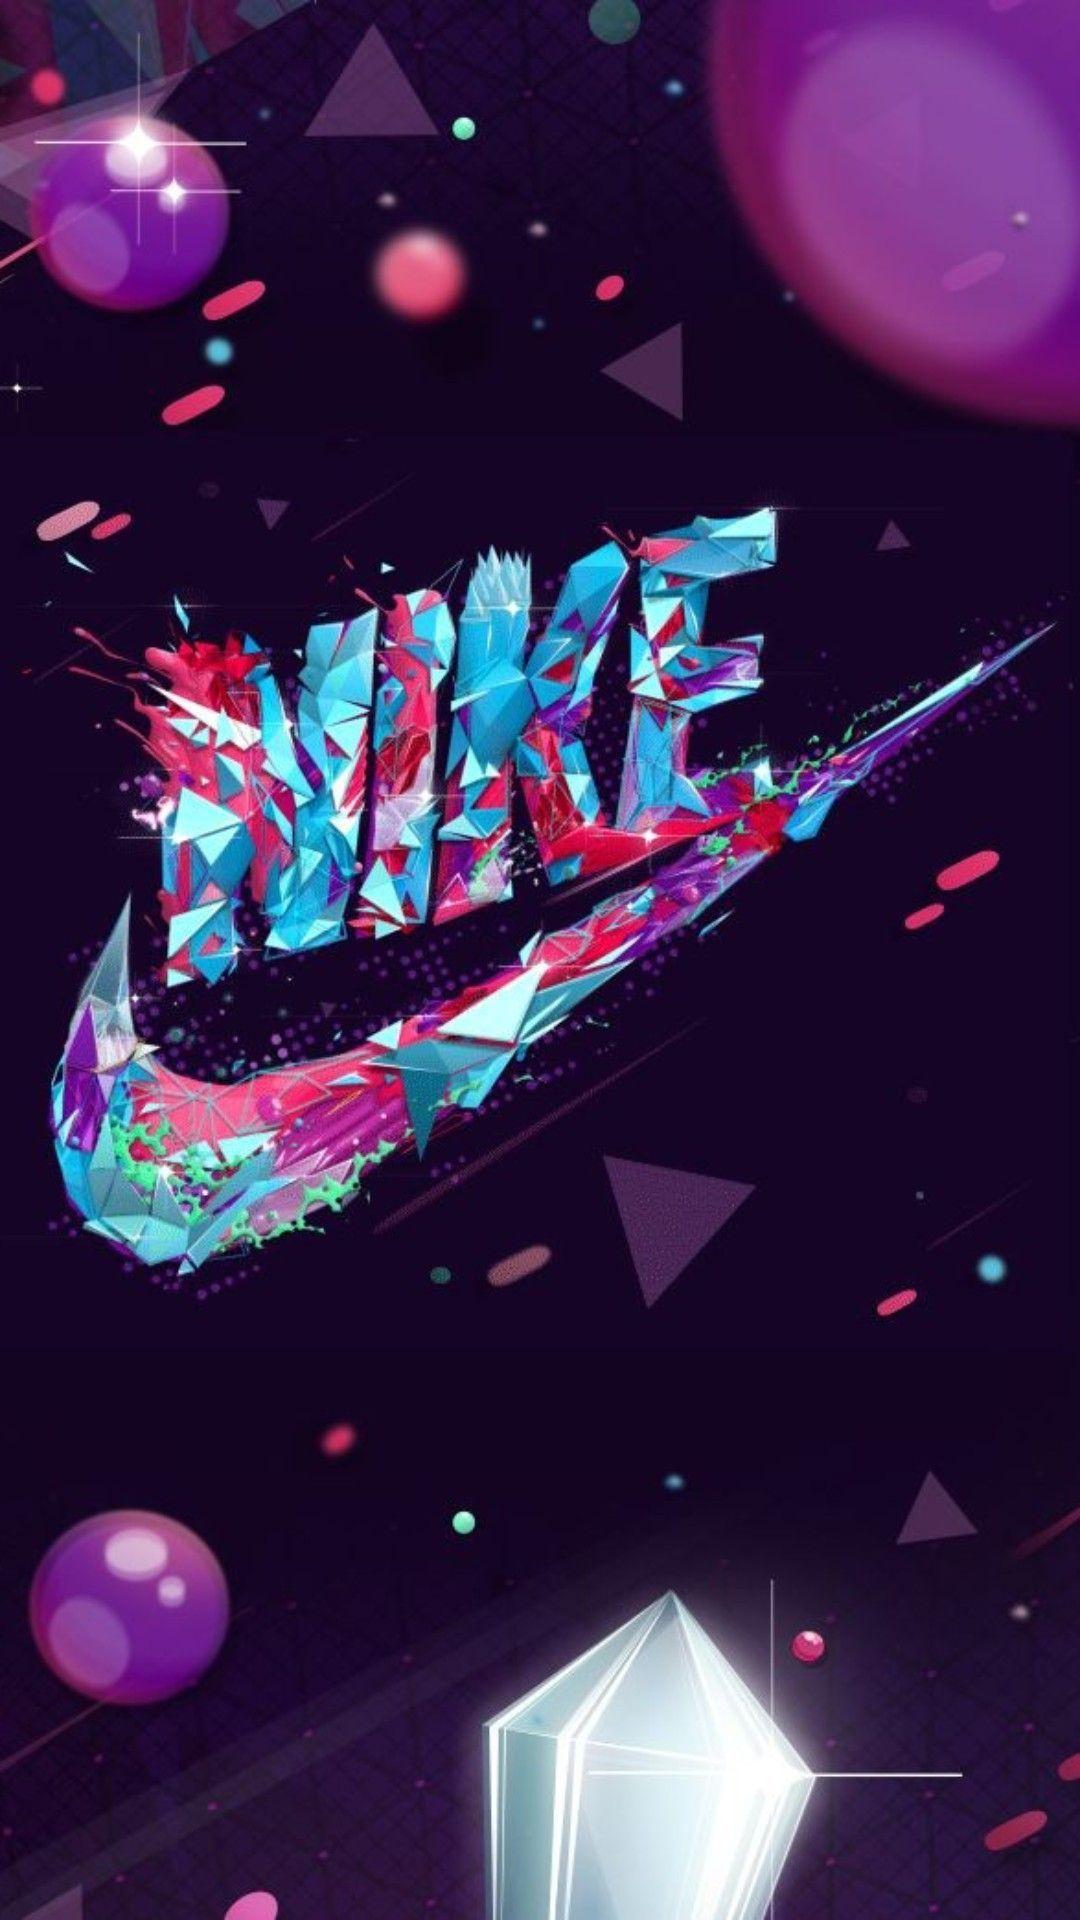 56d0eb17bbb1c65cc5c158fbb754b08d Jpg 1 080 1 920 Pixels Fond Ecran Nike Fond Ecran Fond D Ecran Telephone